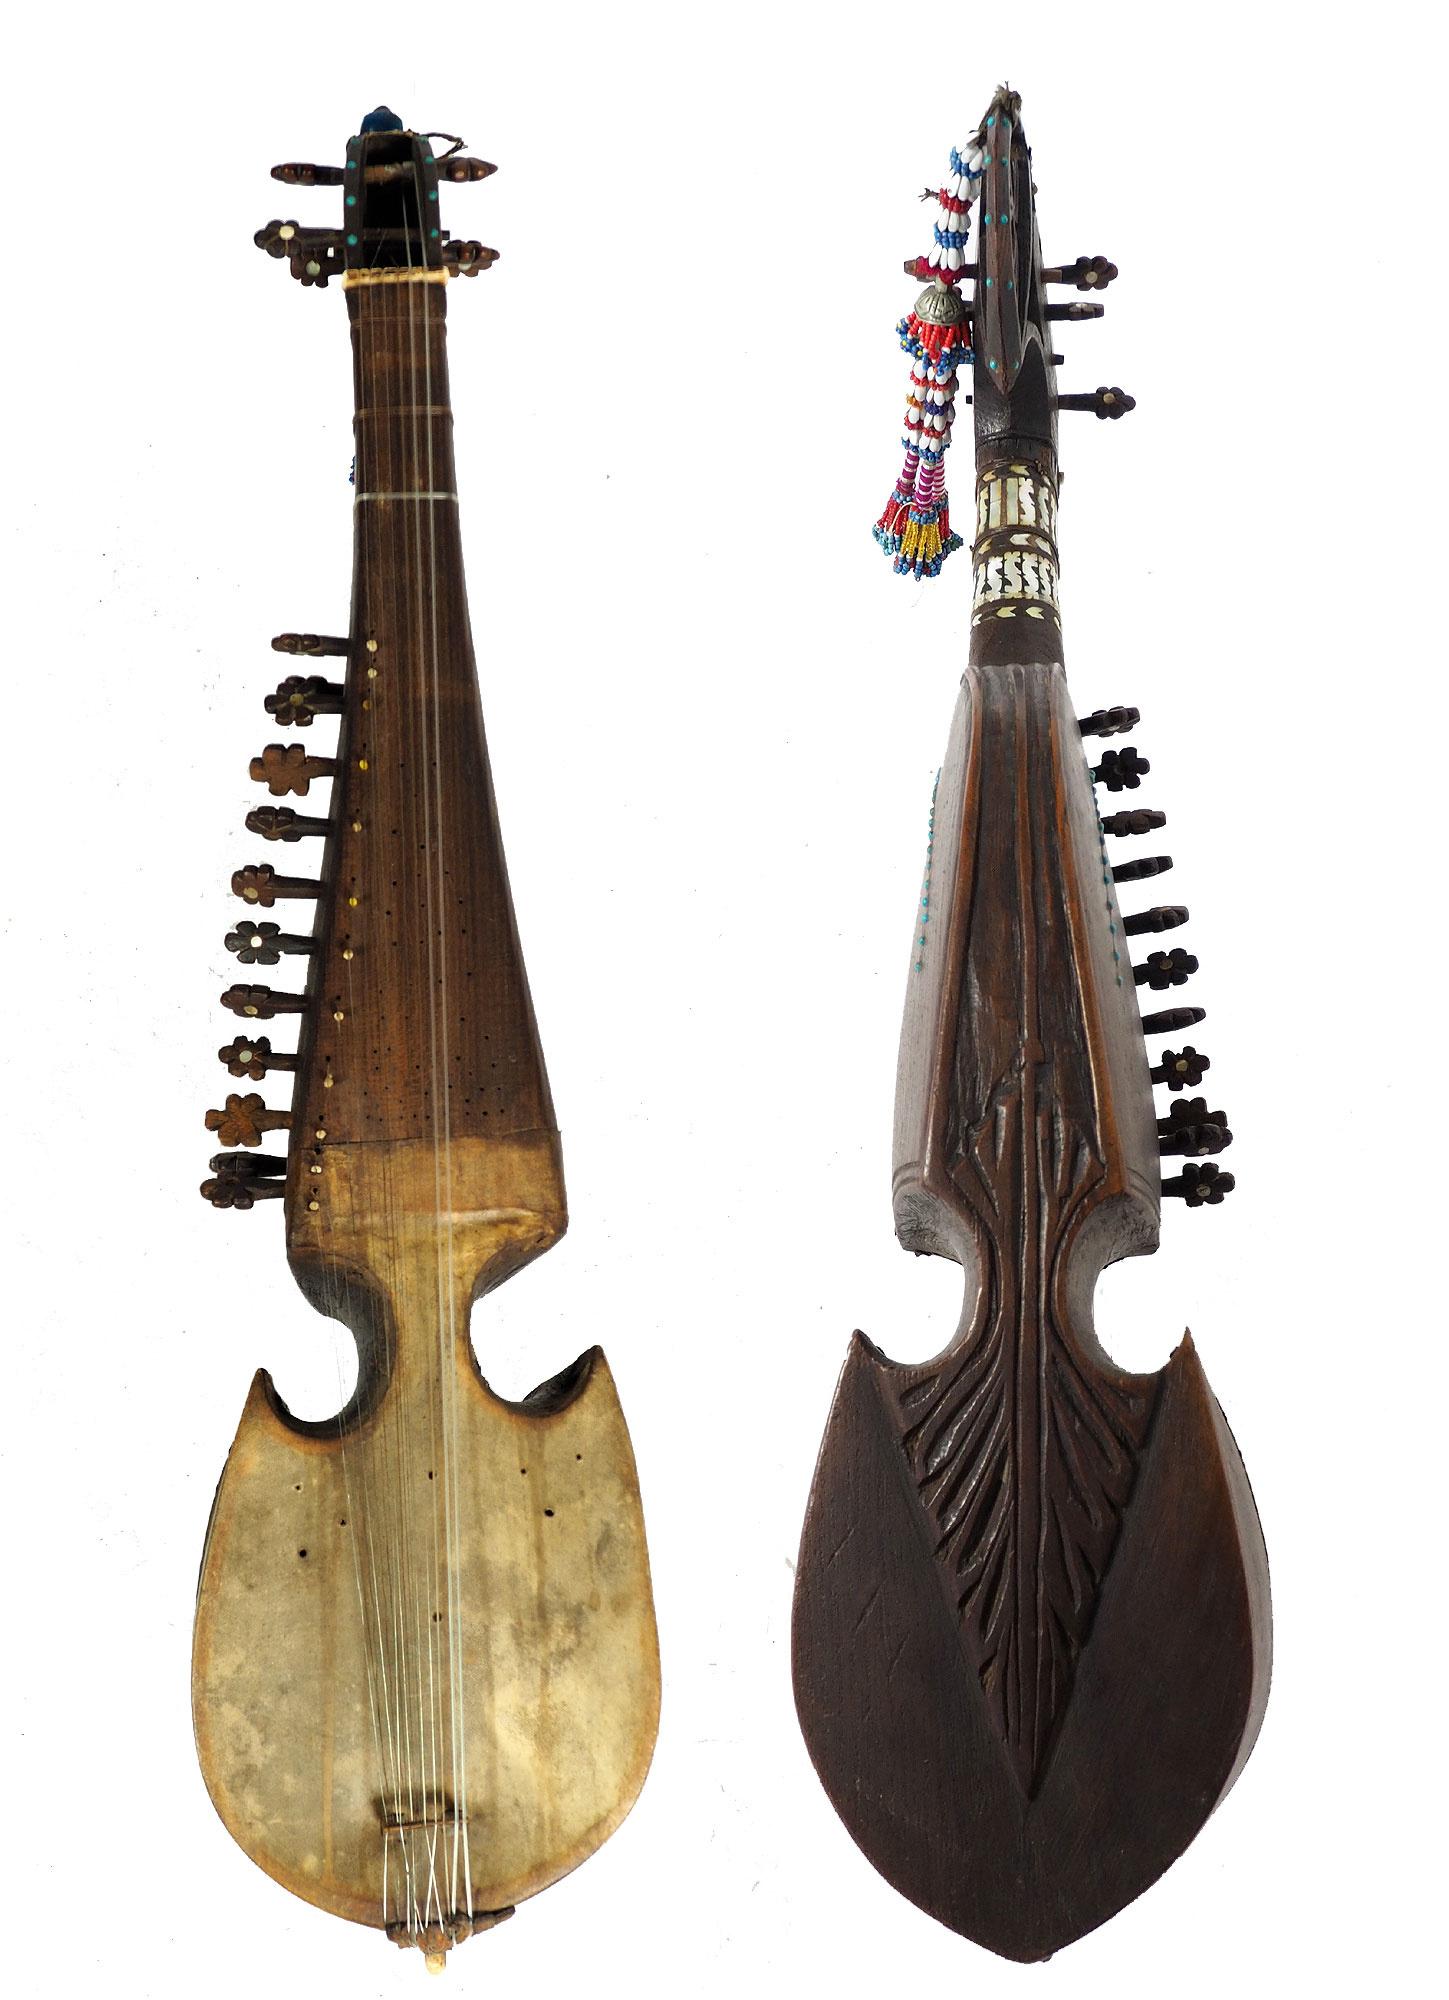 Afghan musikinstrumen Bubab Nr-19/A